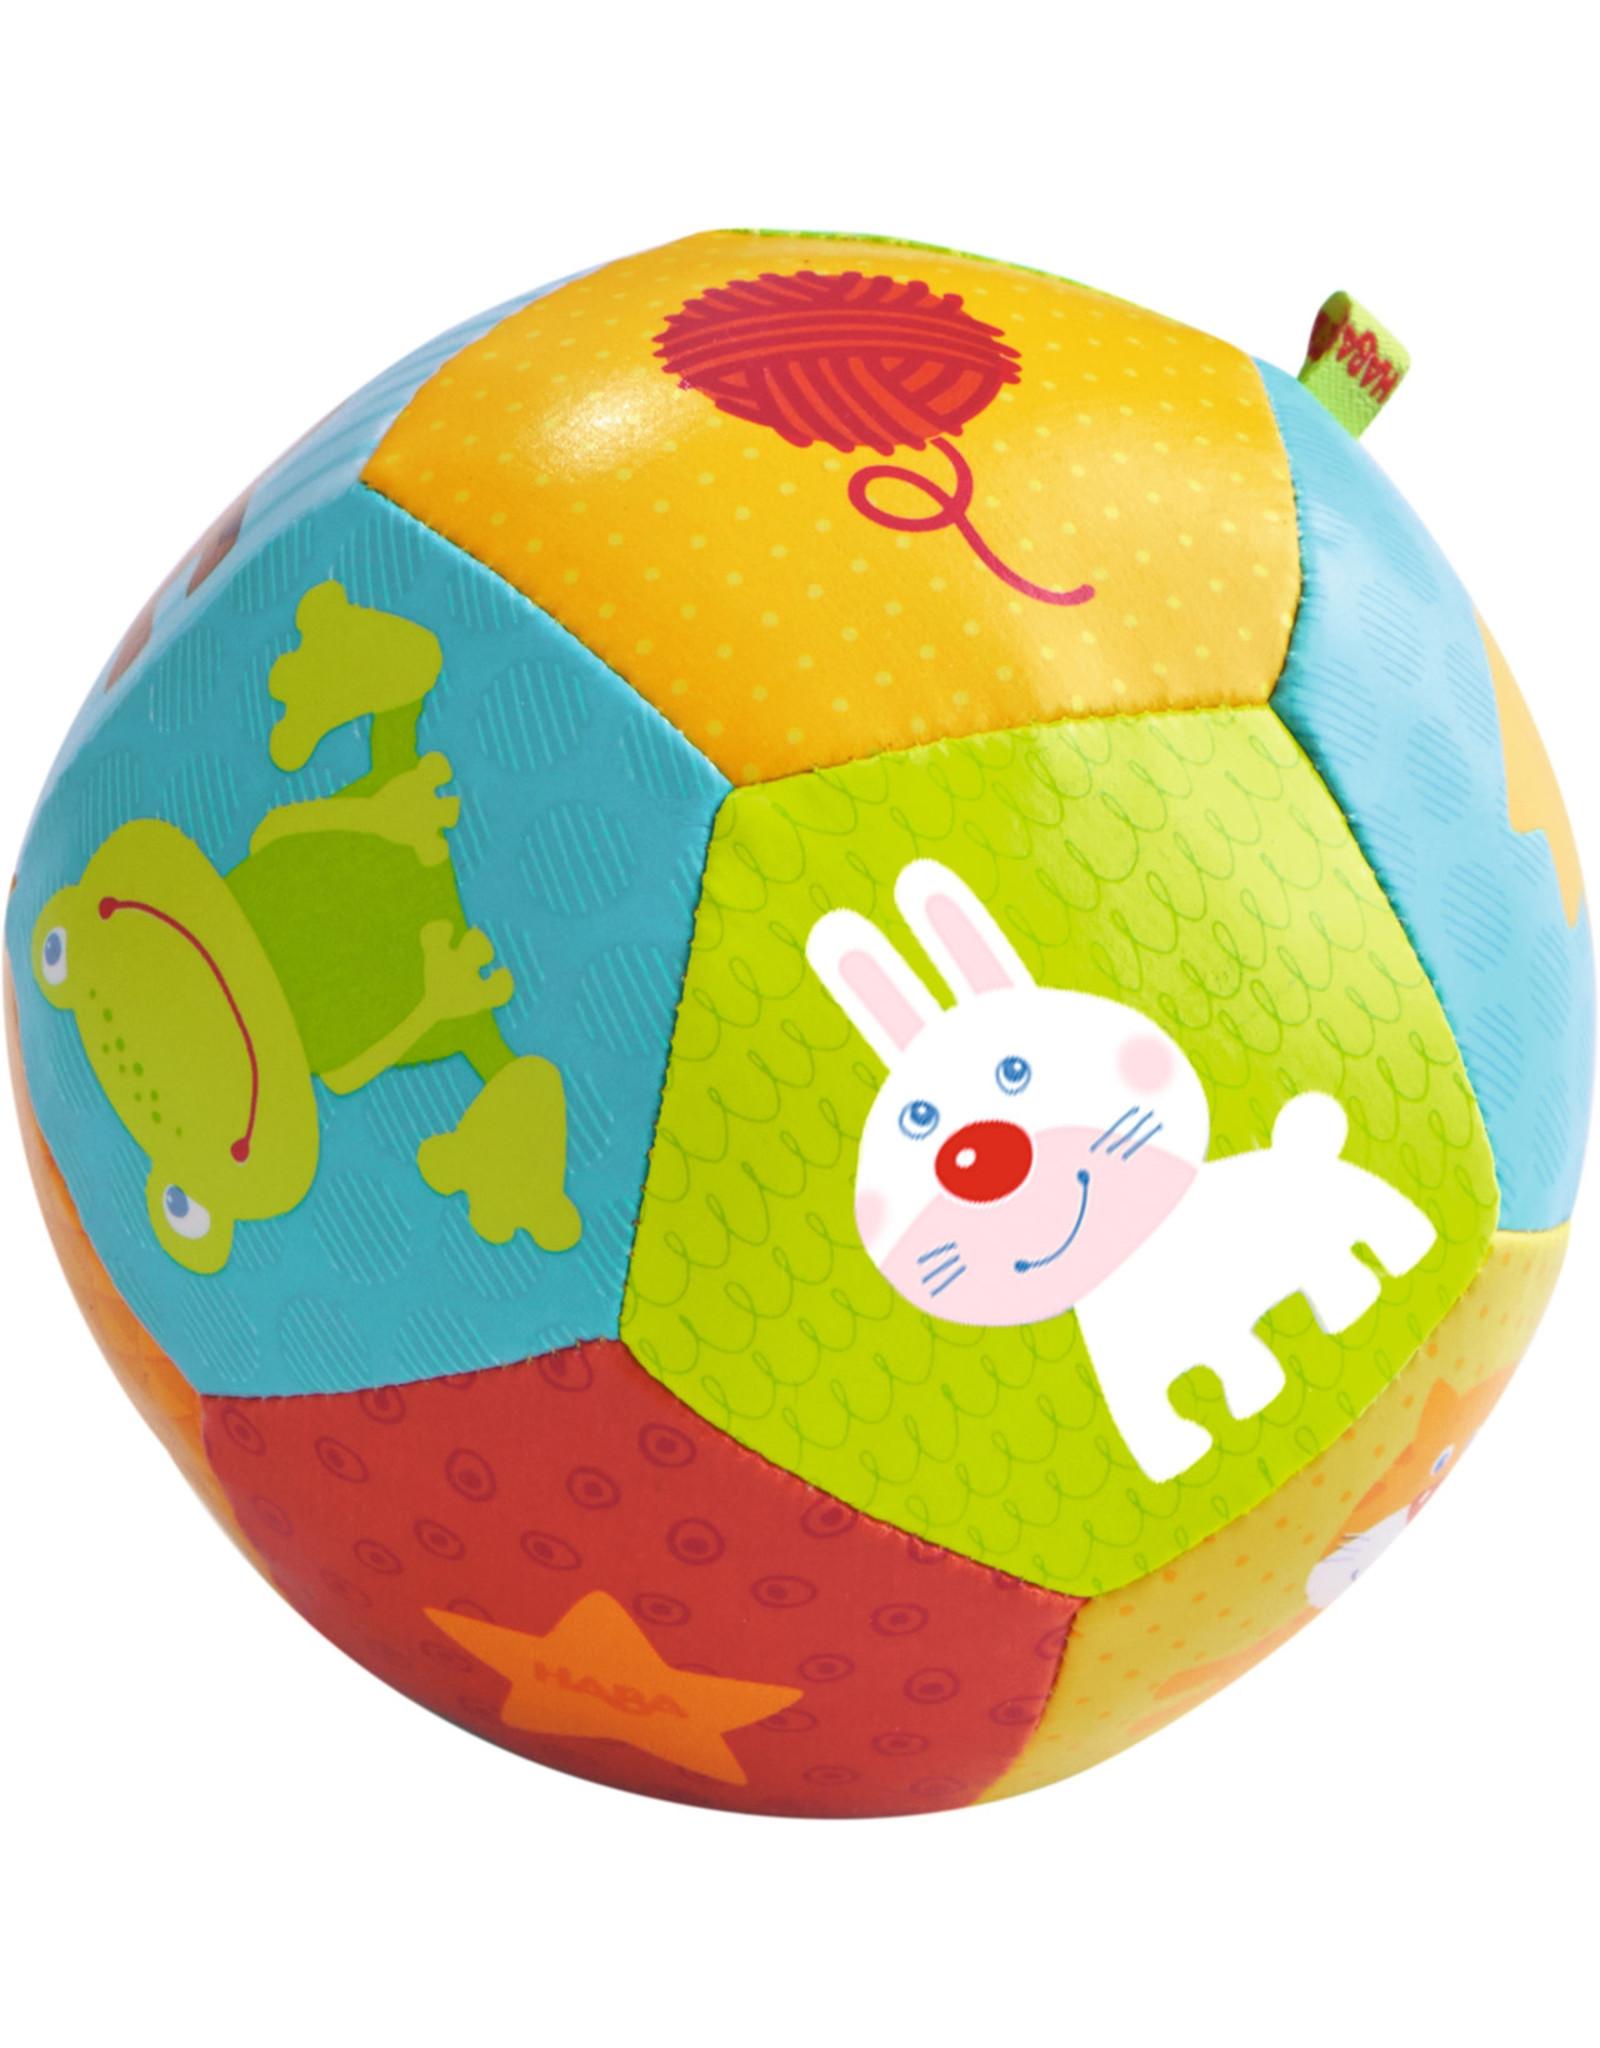 "Haba Baby Ball Animal Friends, 4 1/2"""